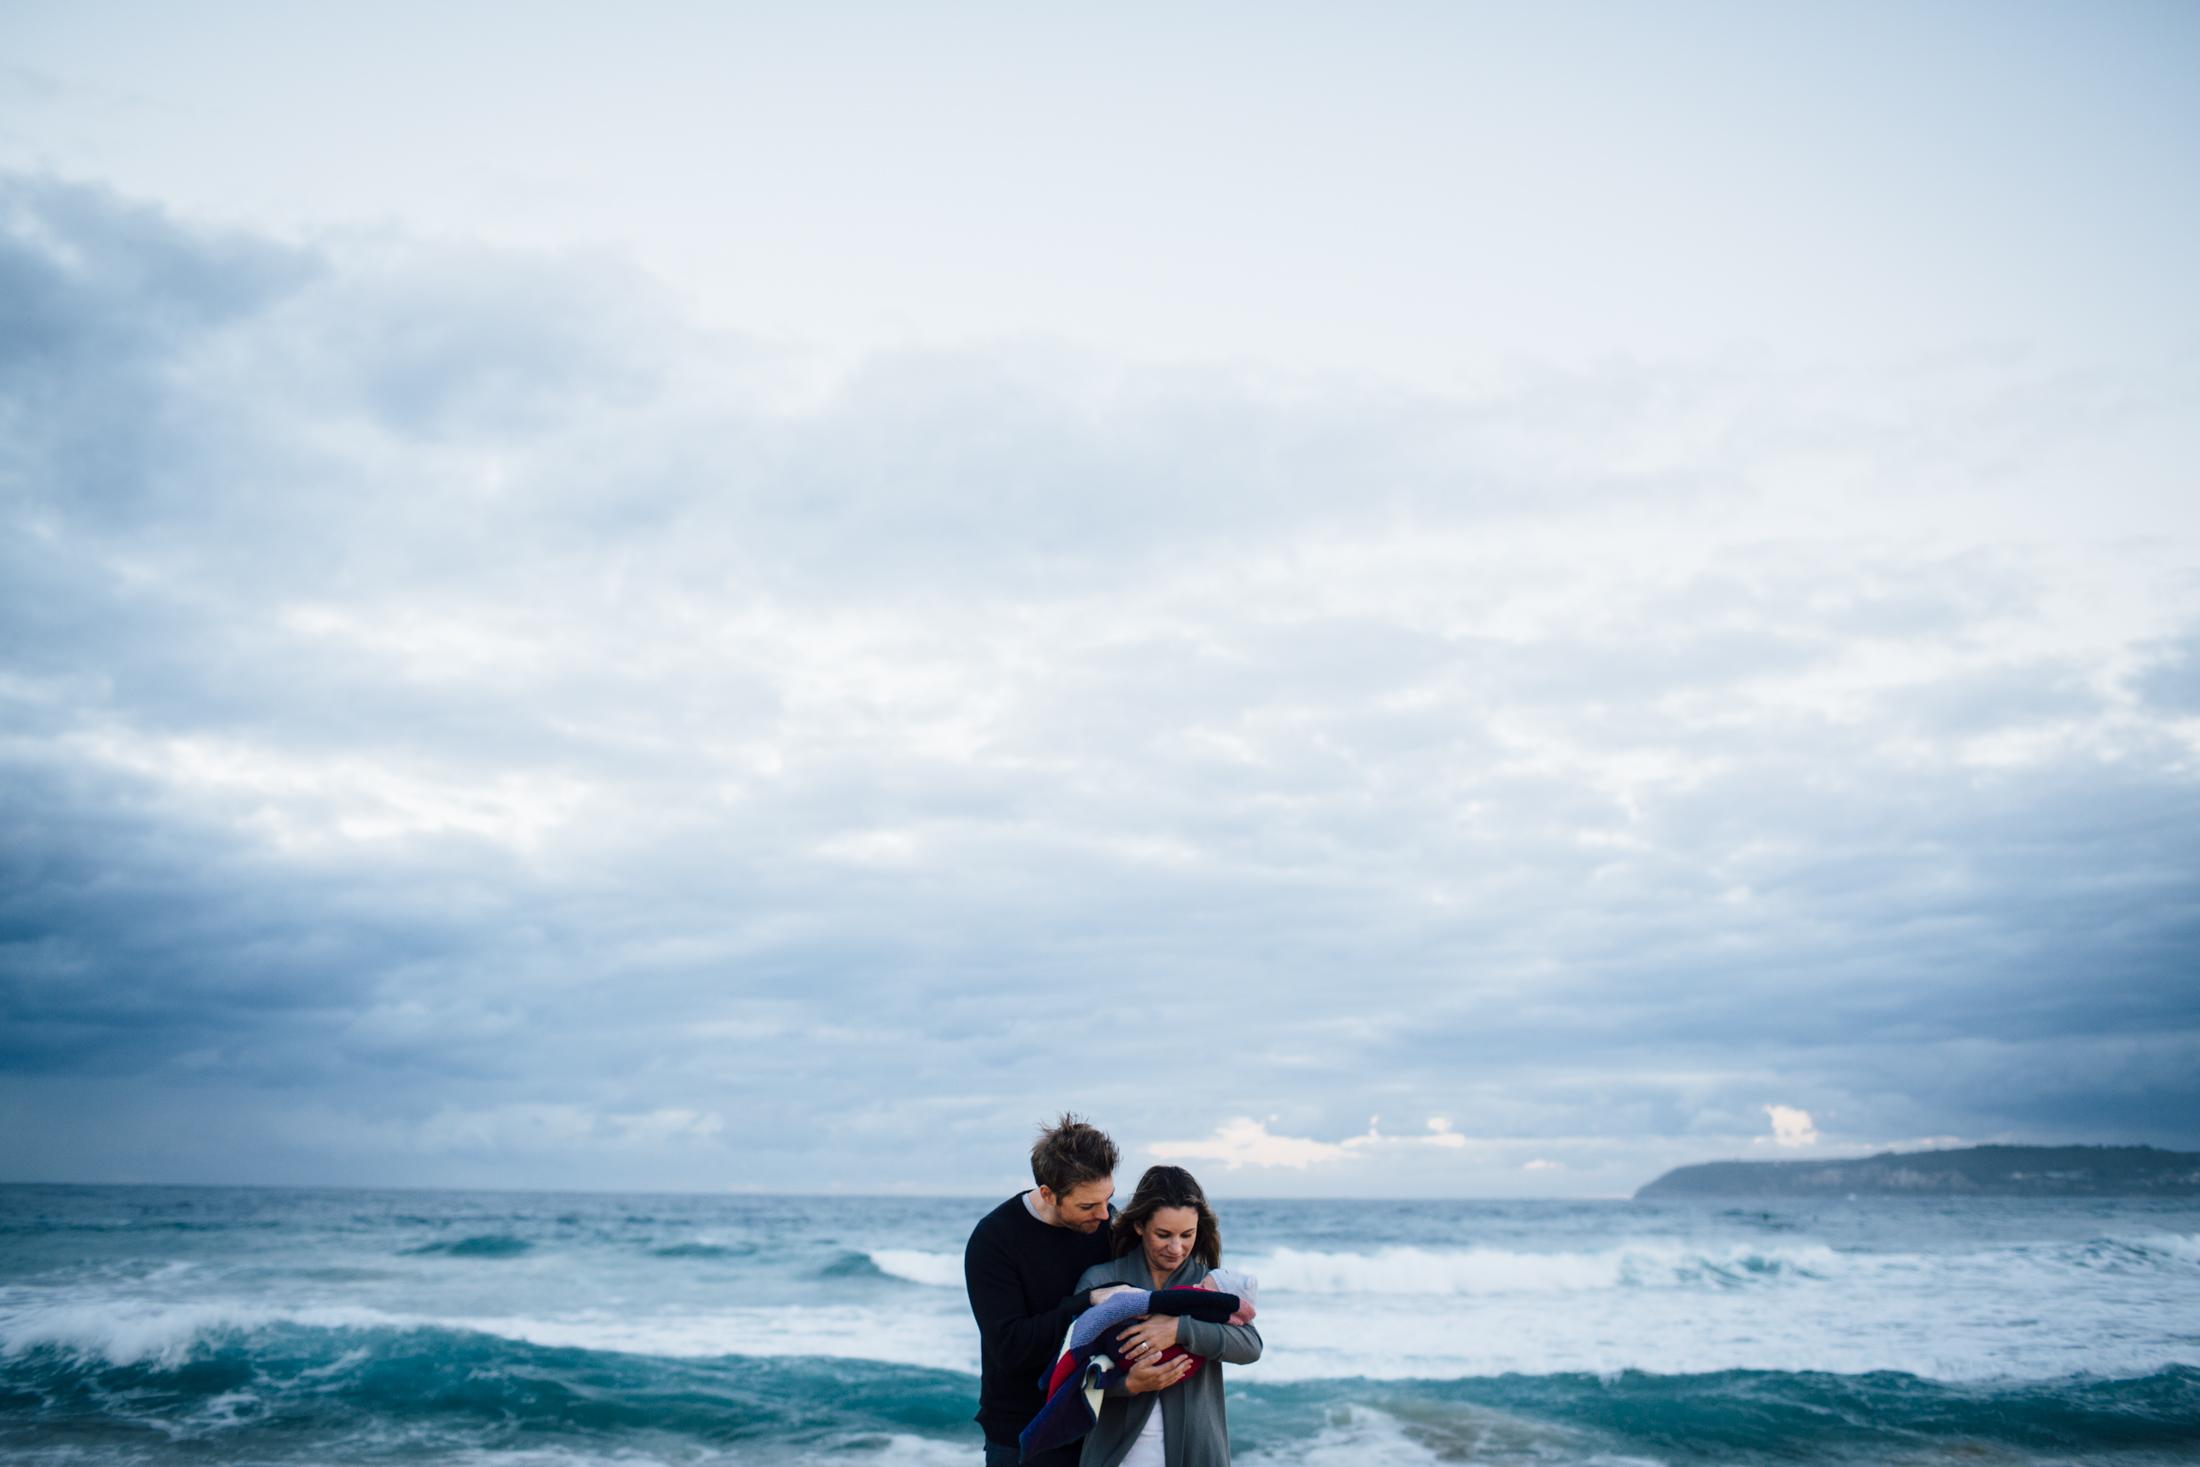 sheridan_nilsson_northern_beaches_family_lifestyle_photographer-4533.jpg